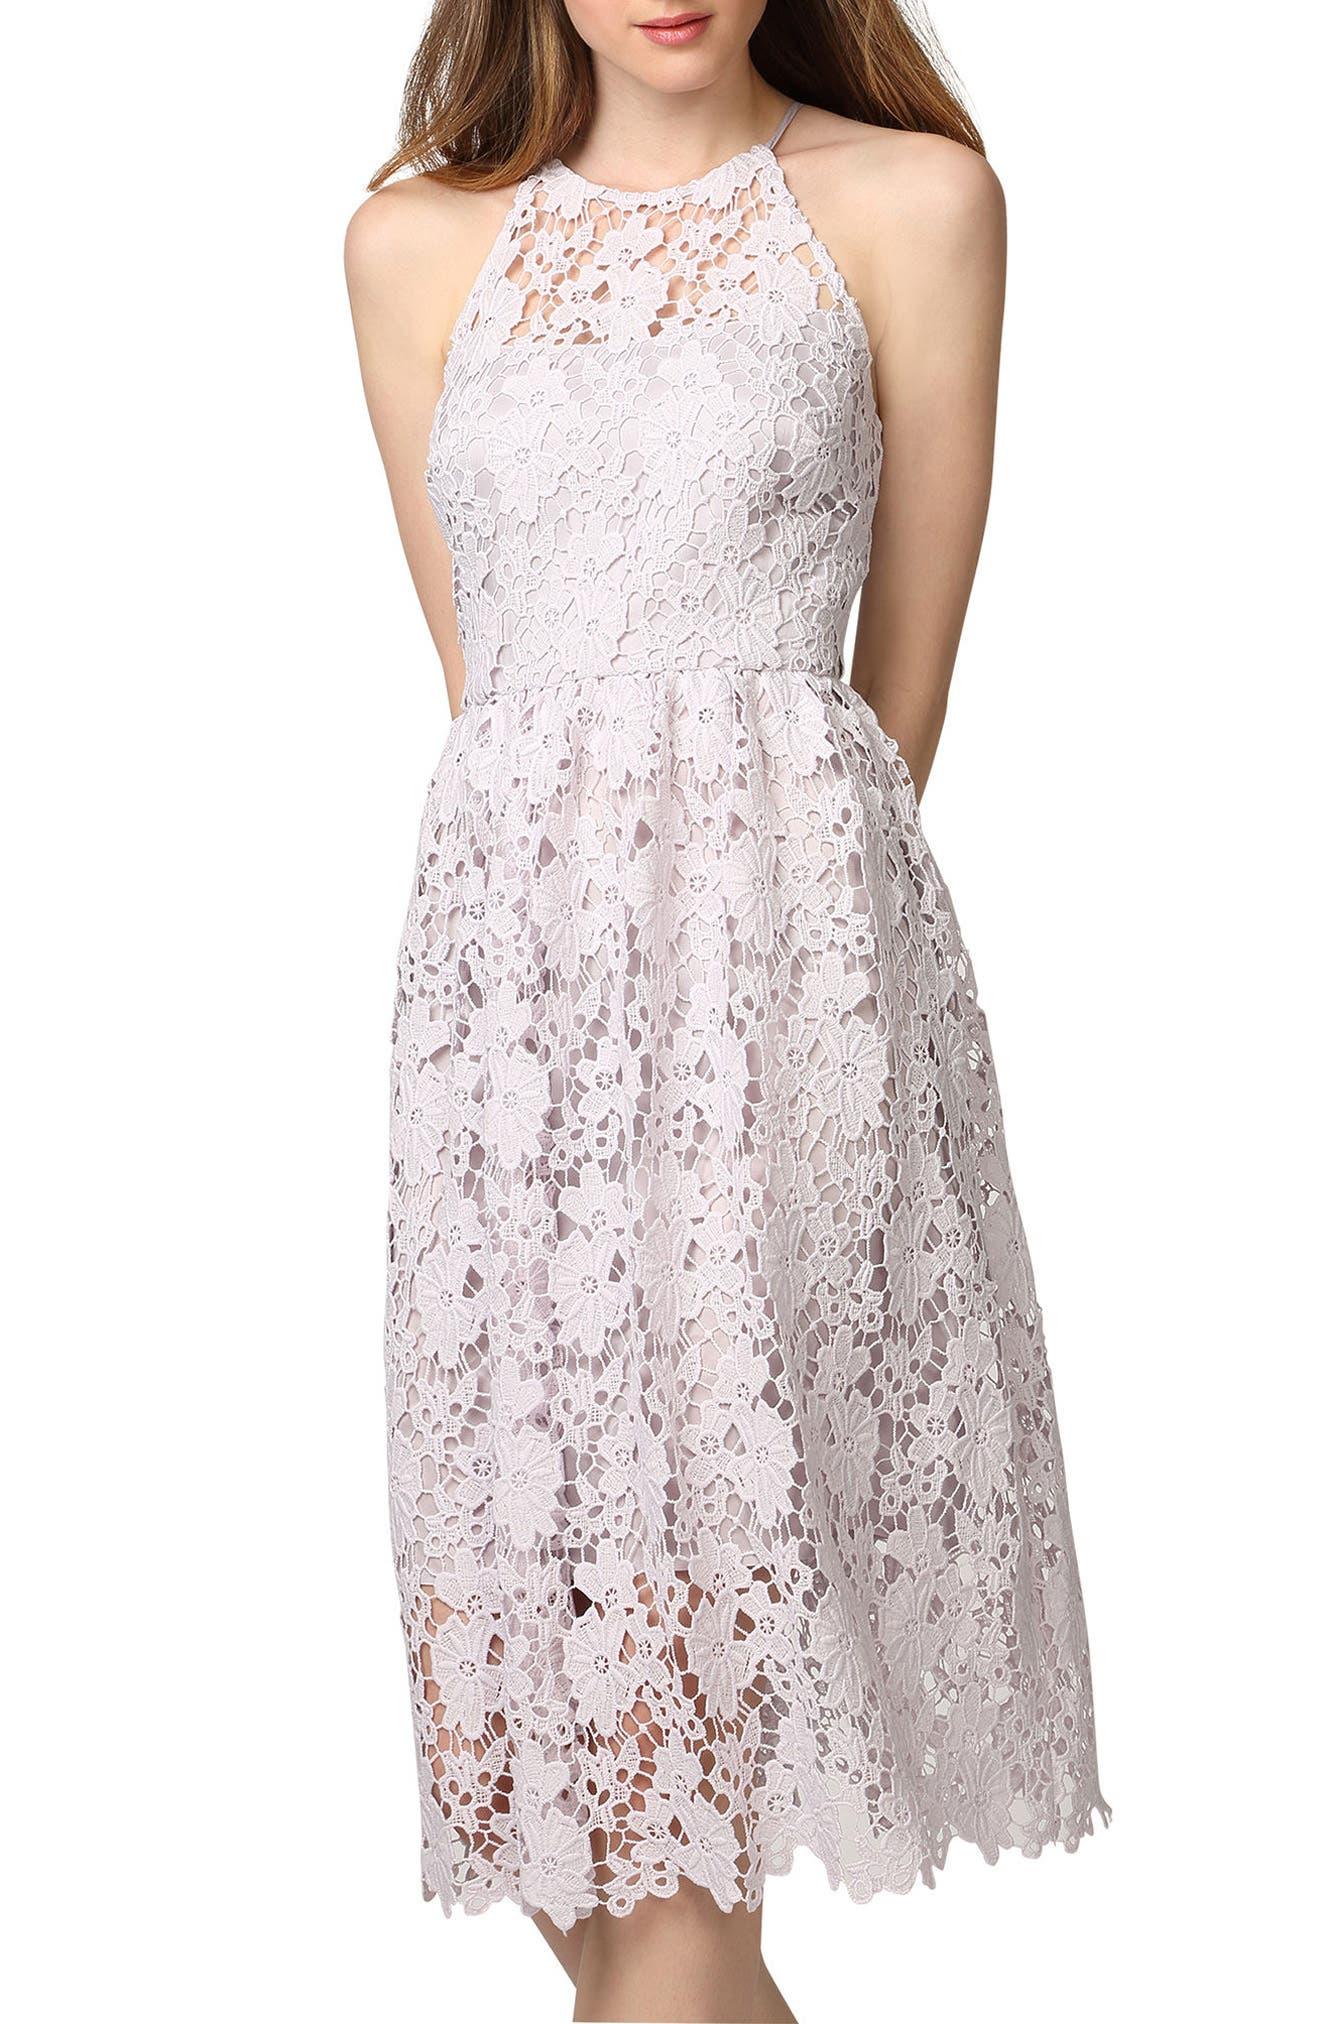 Chemical Lace Fit & Flare Midi Dress,                             Main thumbnail 1, color,                             450